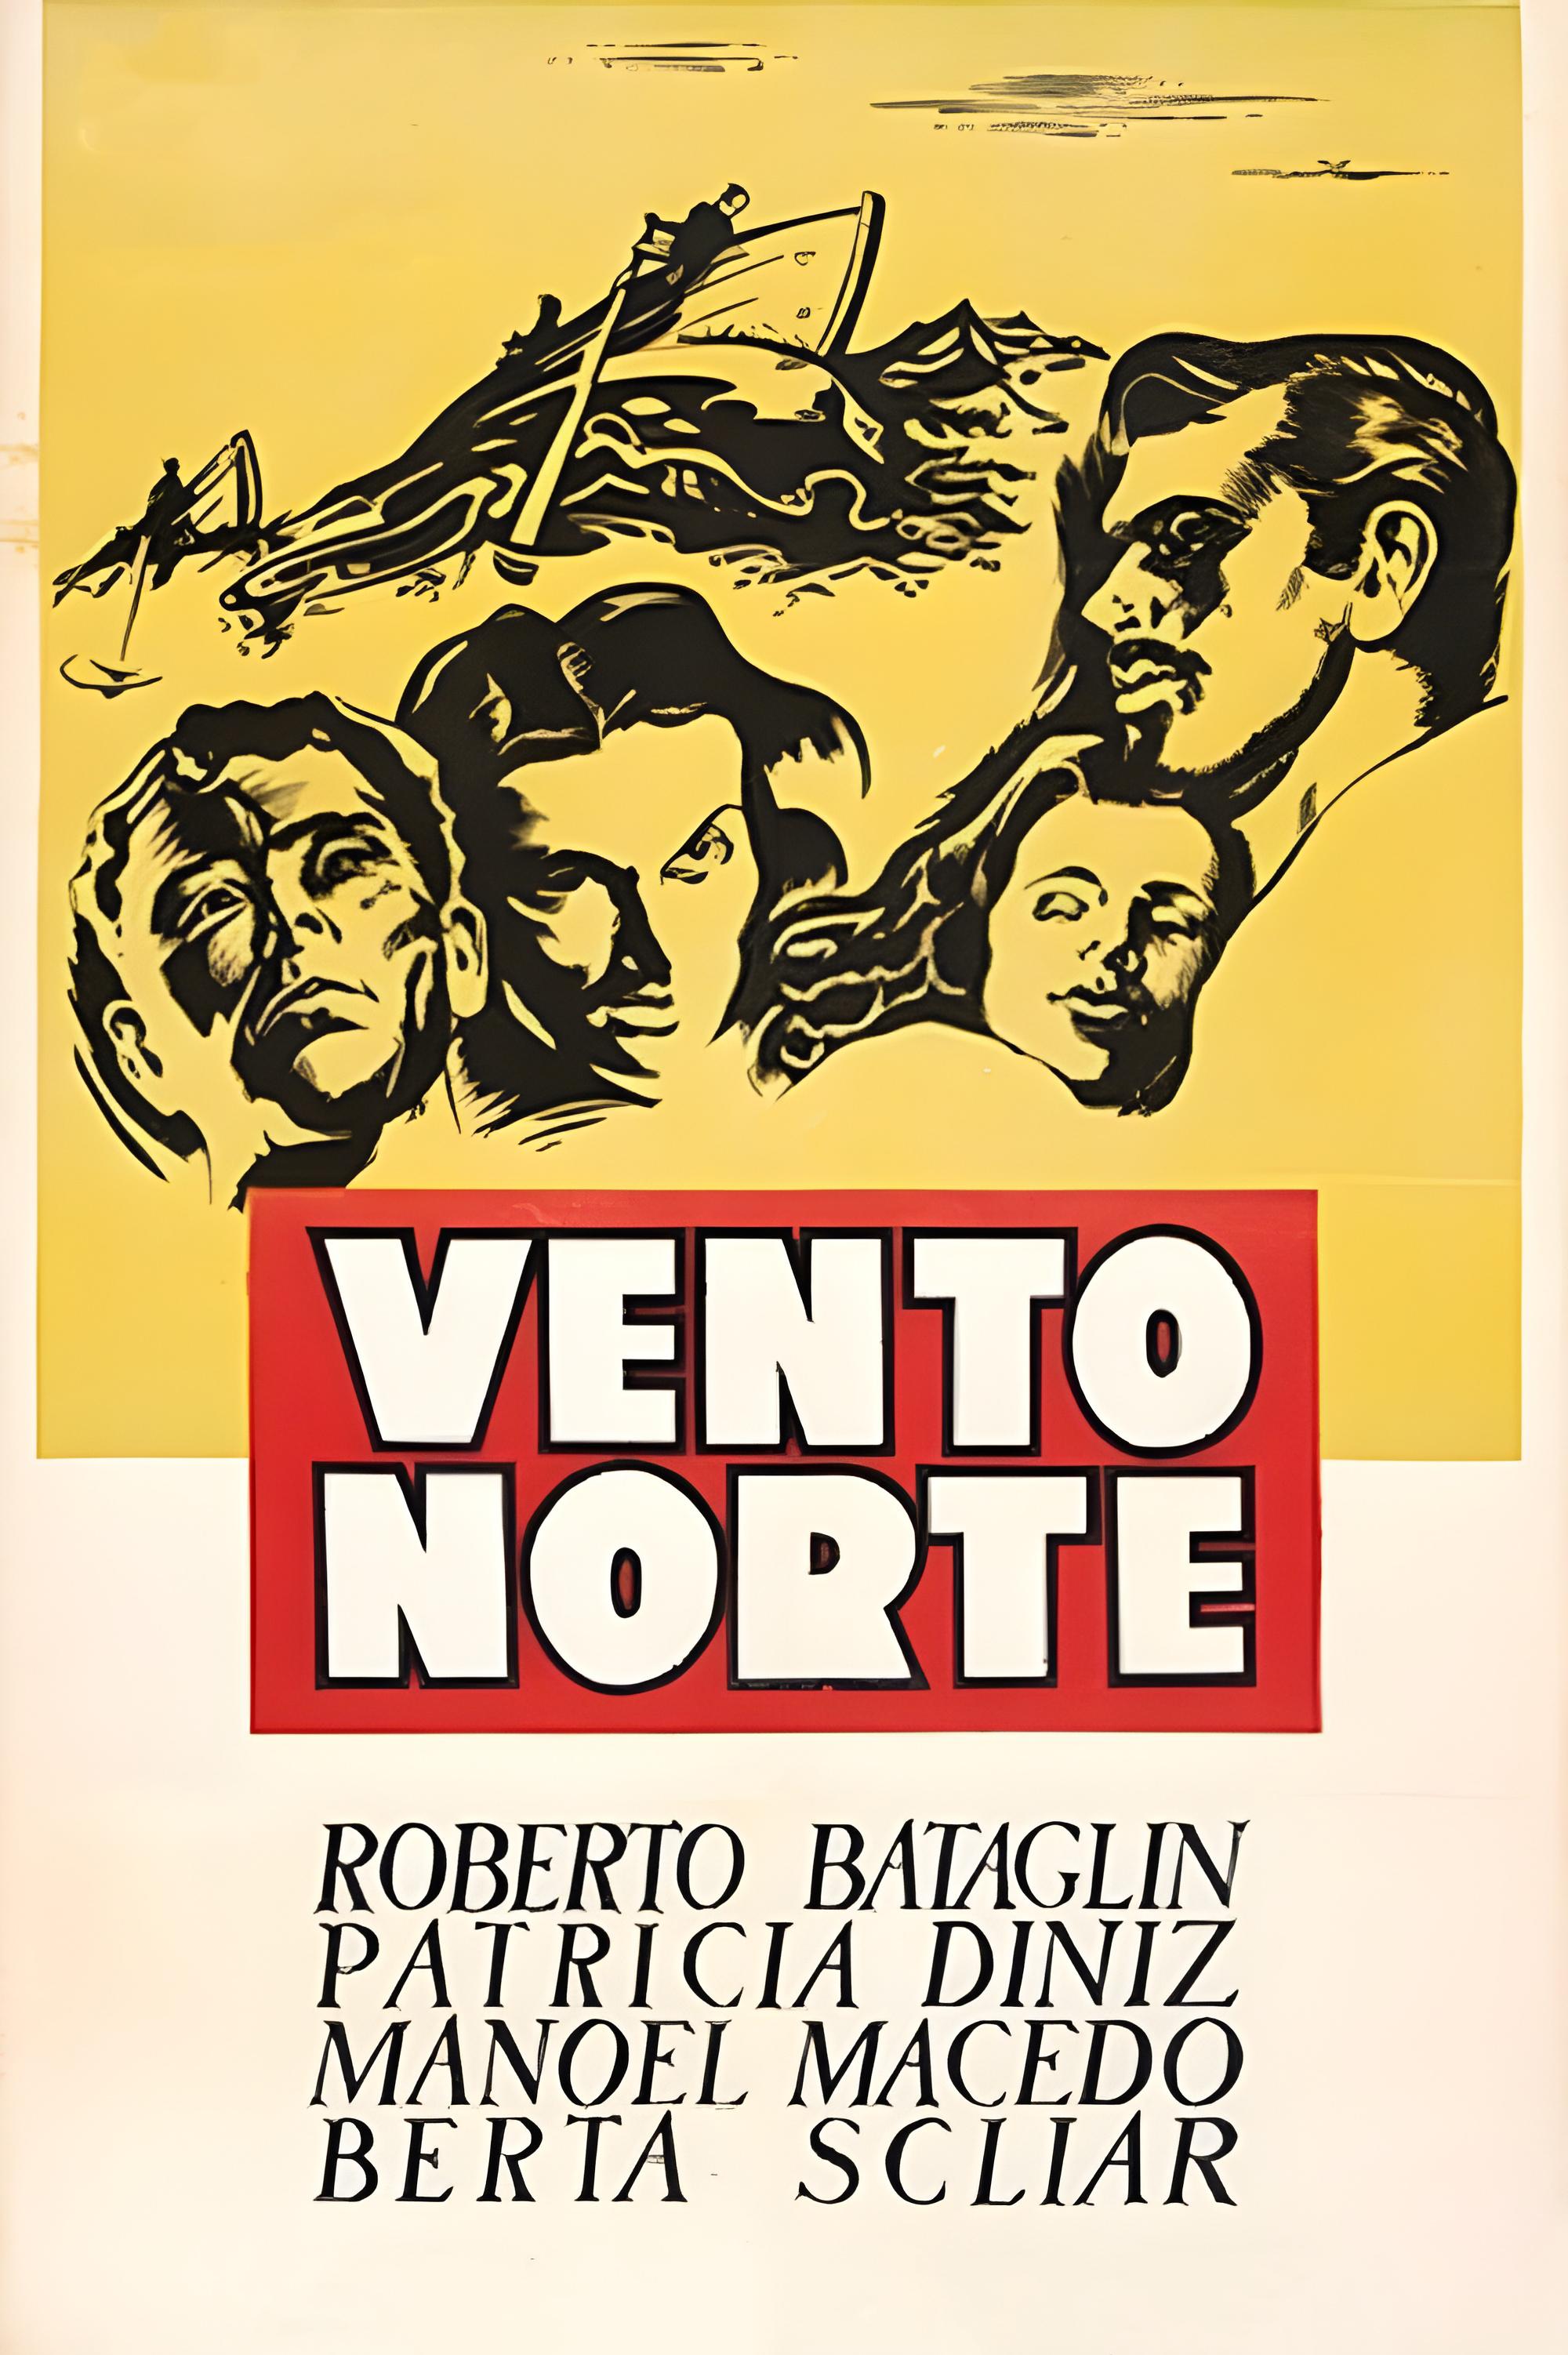 Vento Norte (1951)